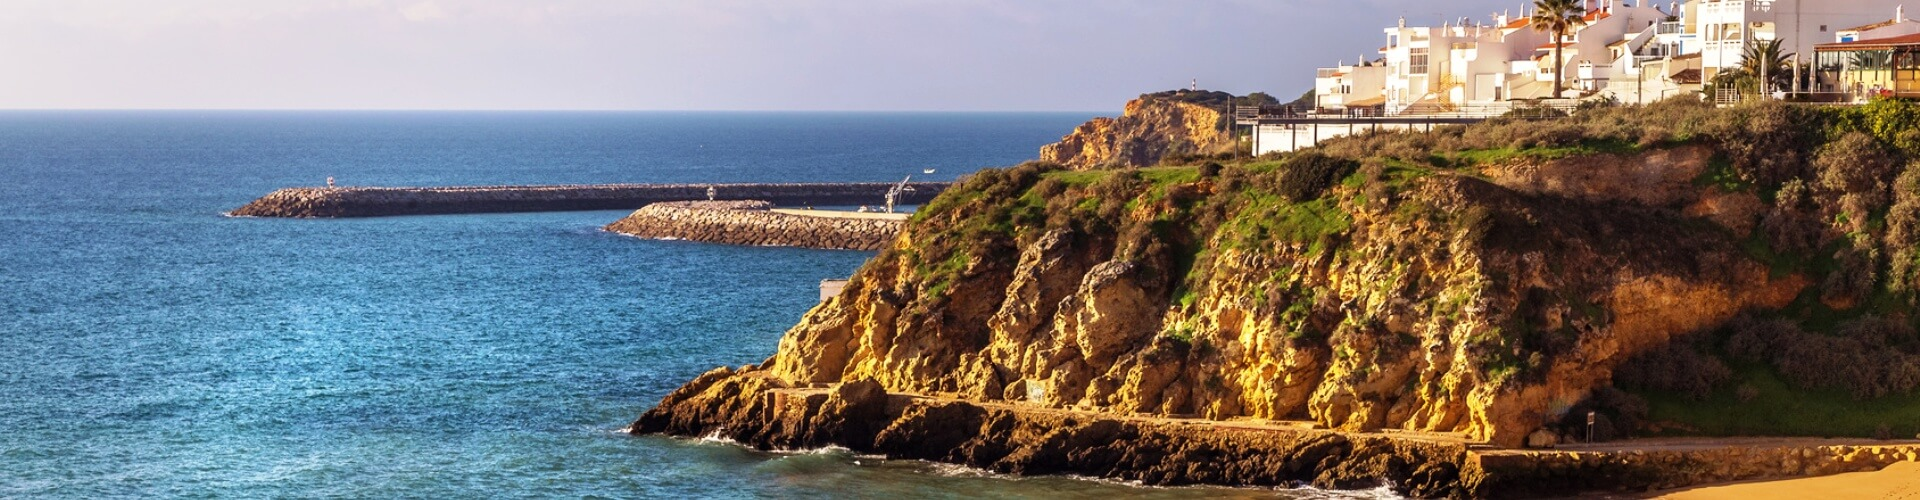 Carvoeiro coastal town, Algarve